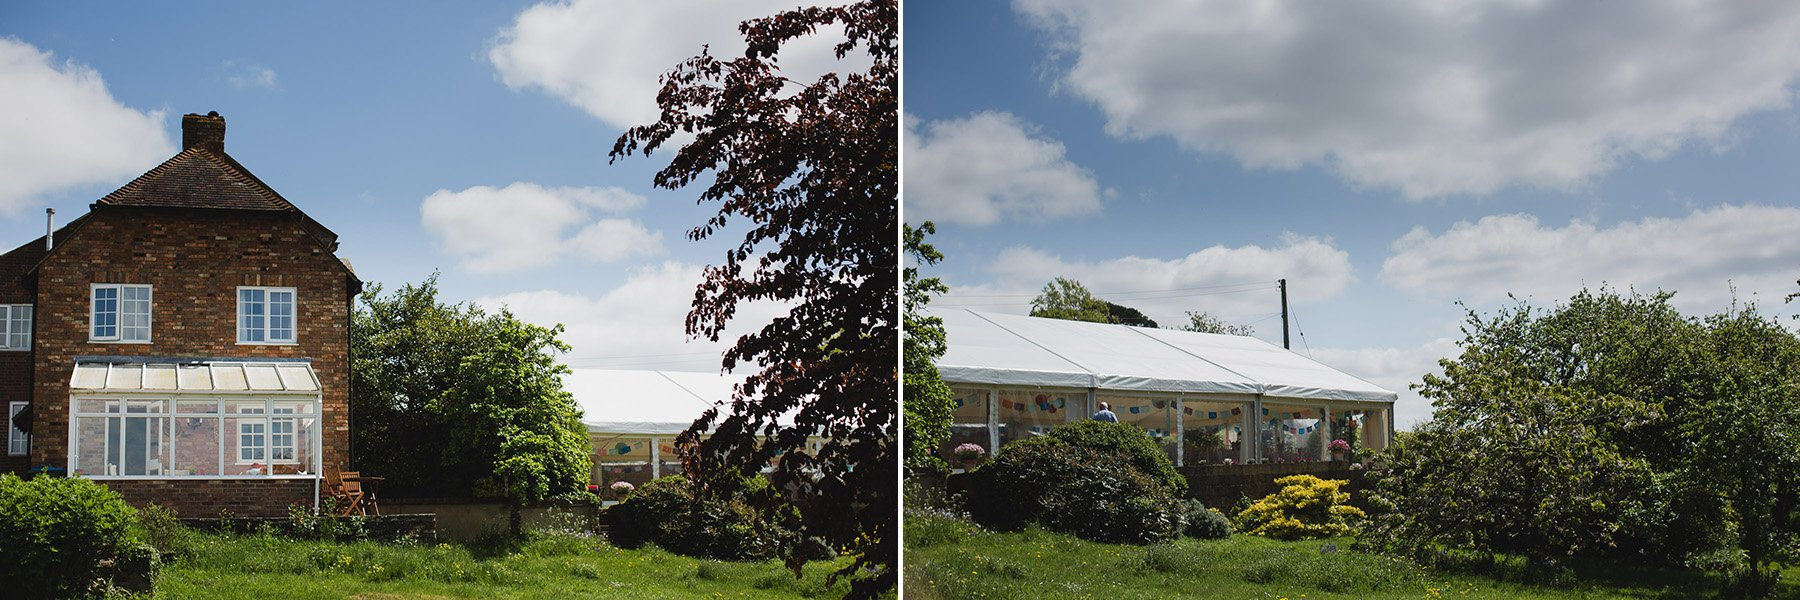 Buckinghamshire-Wedding-Lizzie-Duncan-032